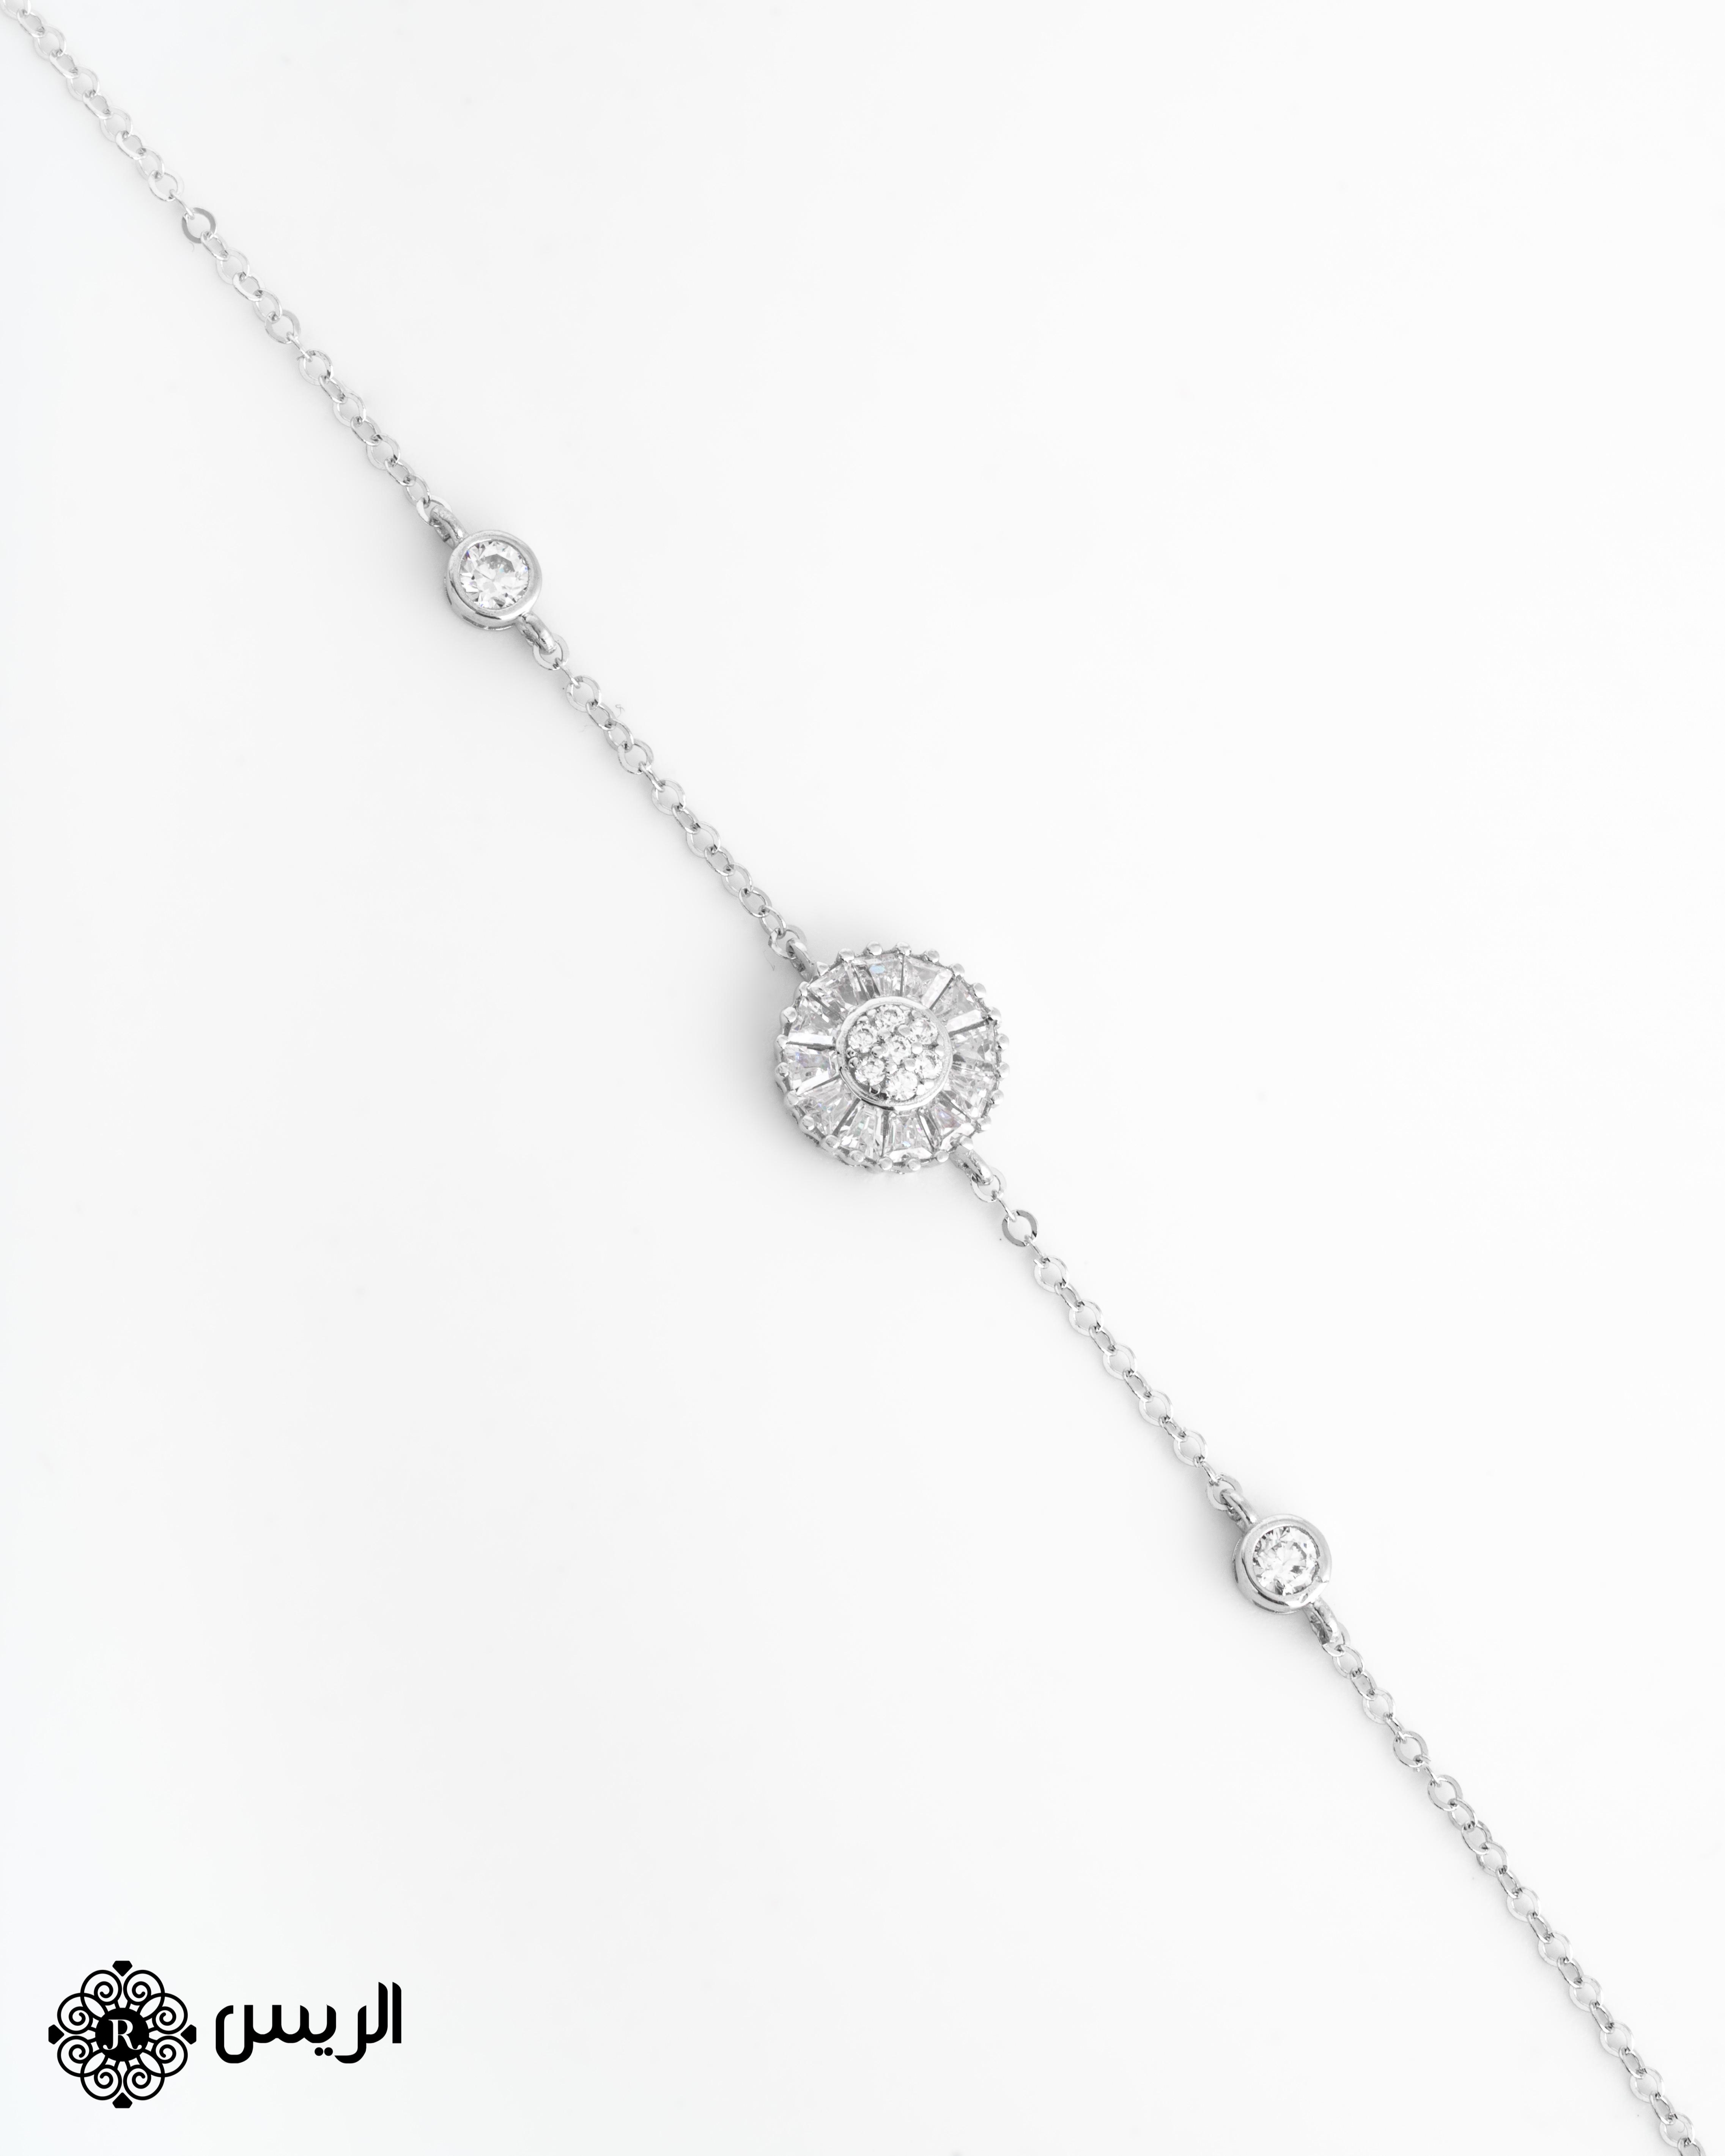 Raies jewelry Solitaire Full Set طقم سوليتير الريس للمجوهرات